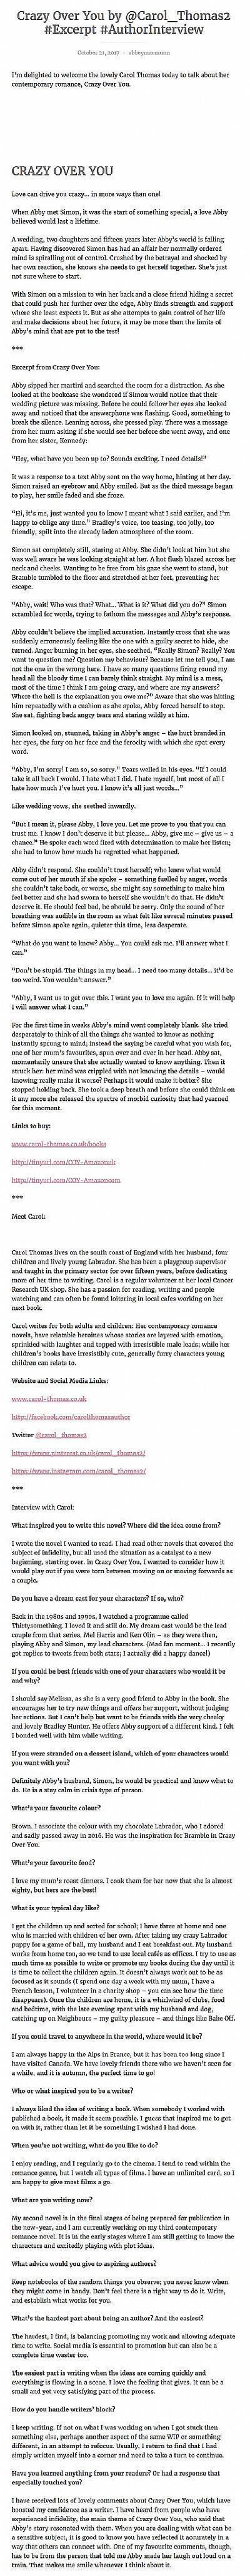 Crazy Over You - Troubador Book Publishing